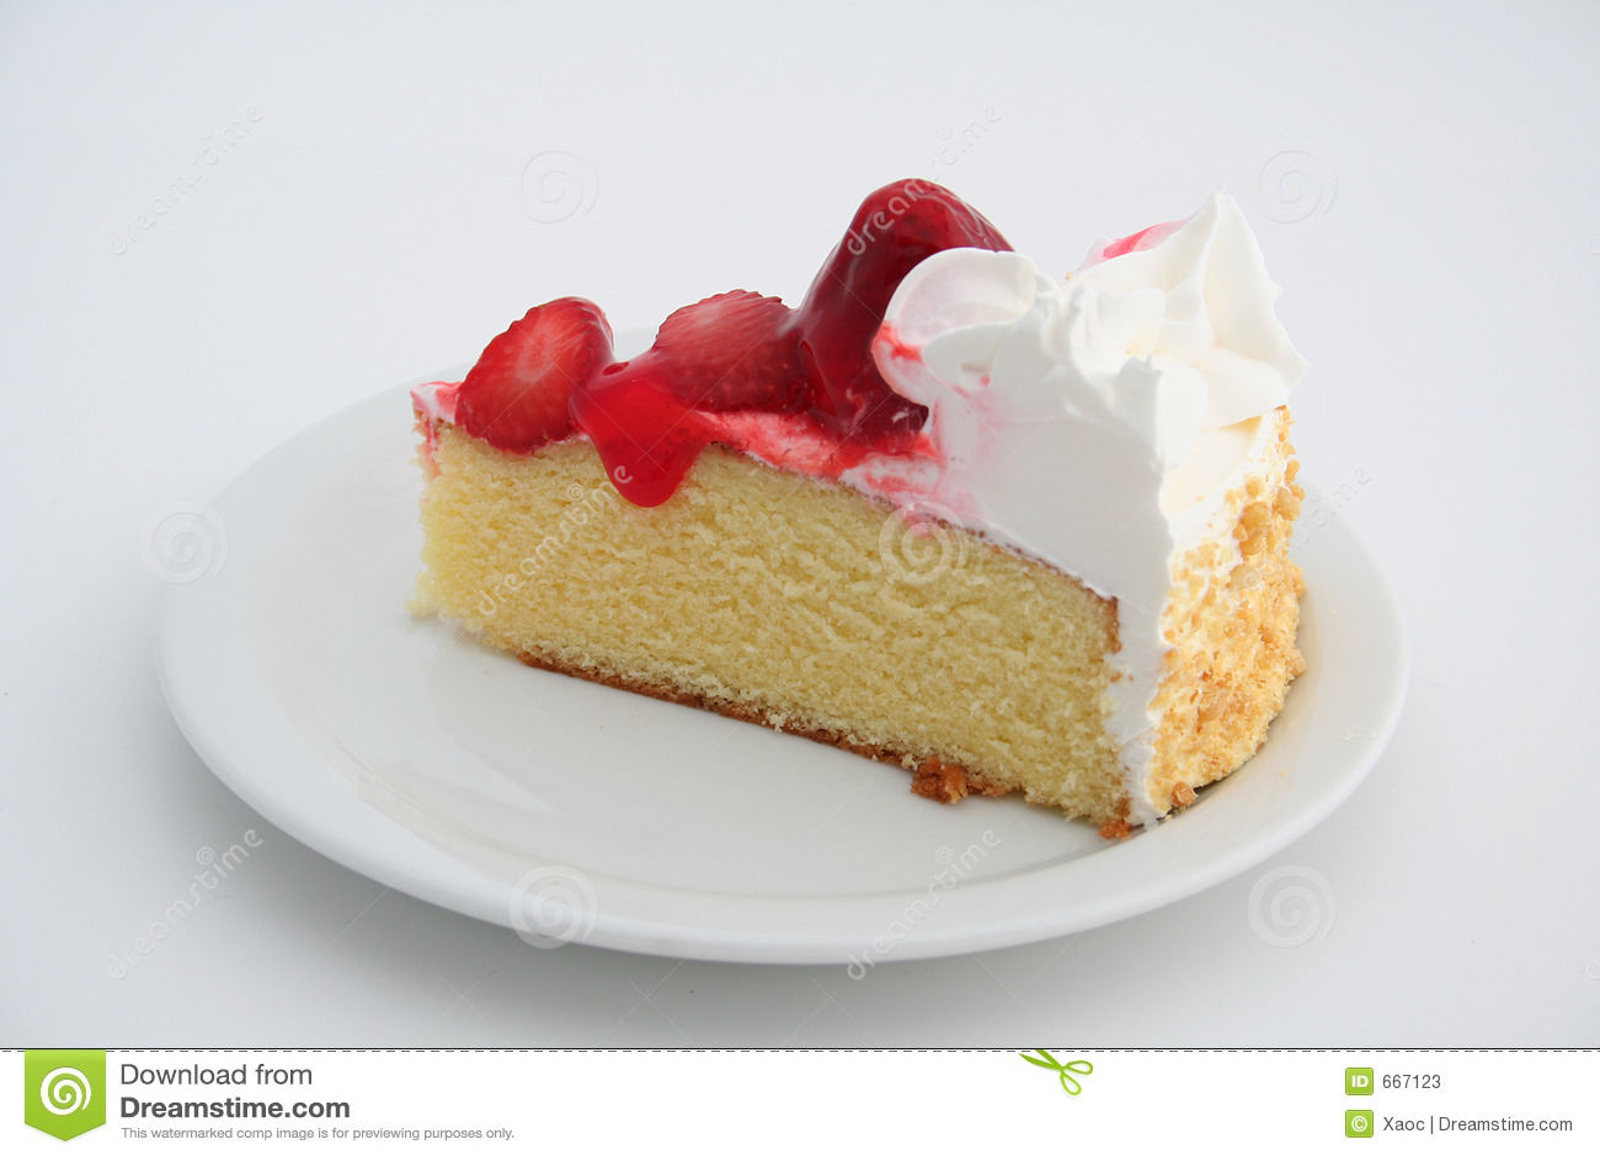 Piece Of Strawberry Cake Stock Photos - Image: 667123